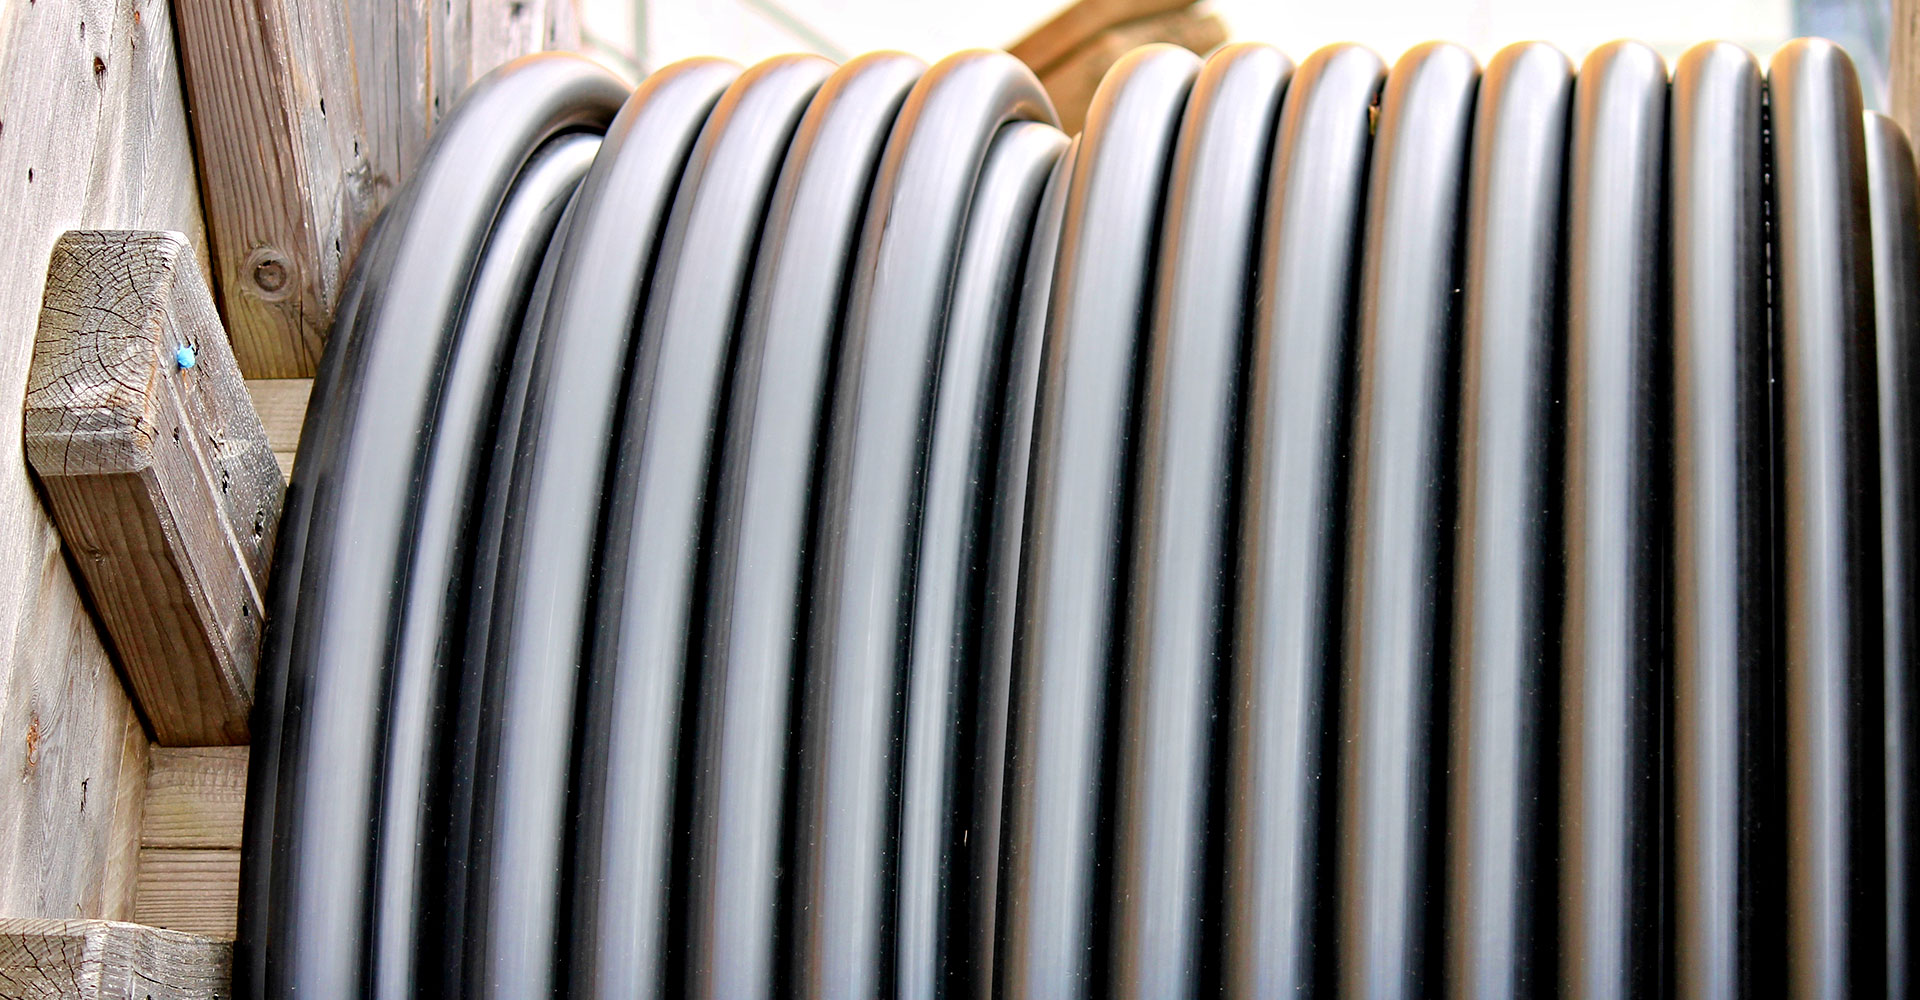 Underground cables equpment & tool